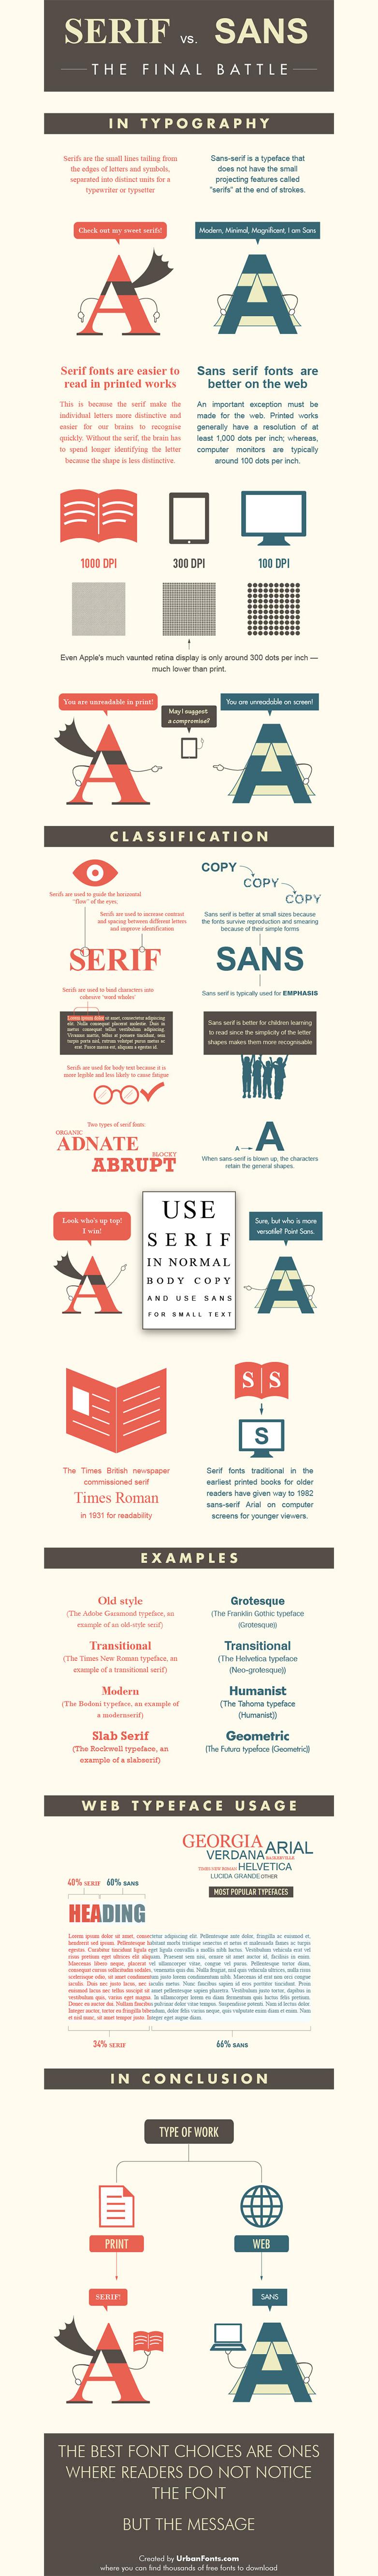 Serif vs Sans Infographic